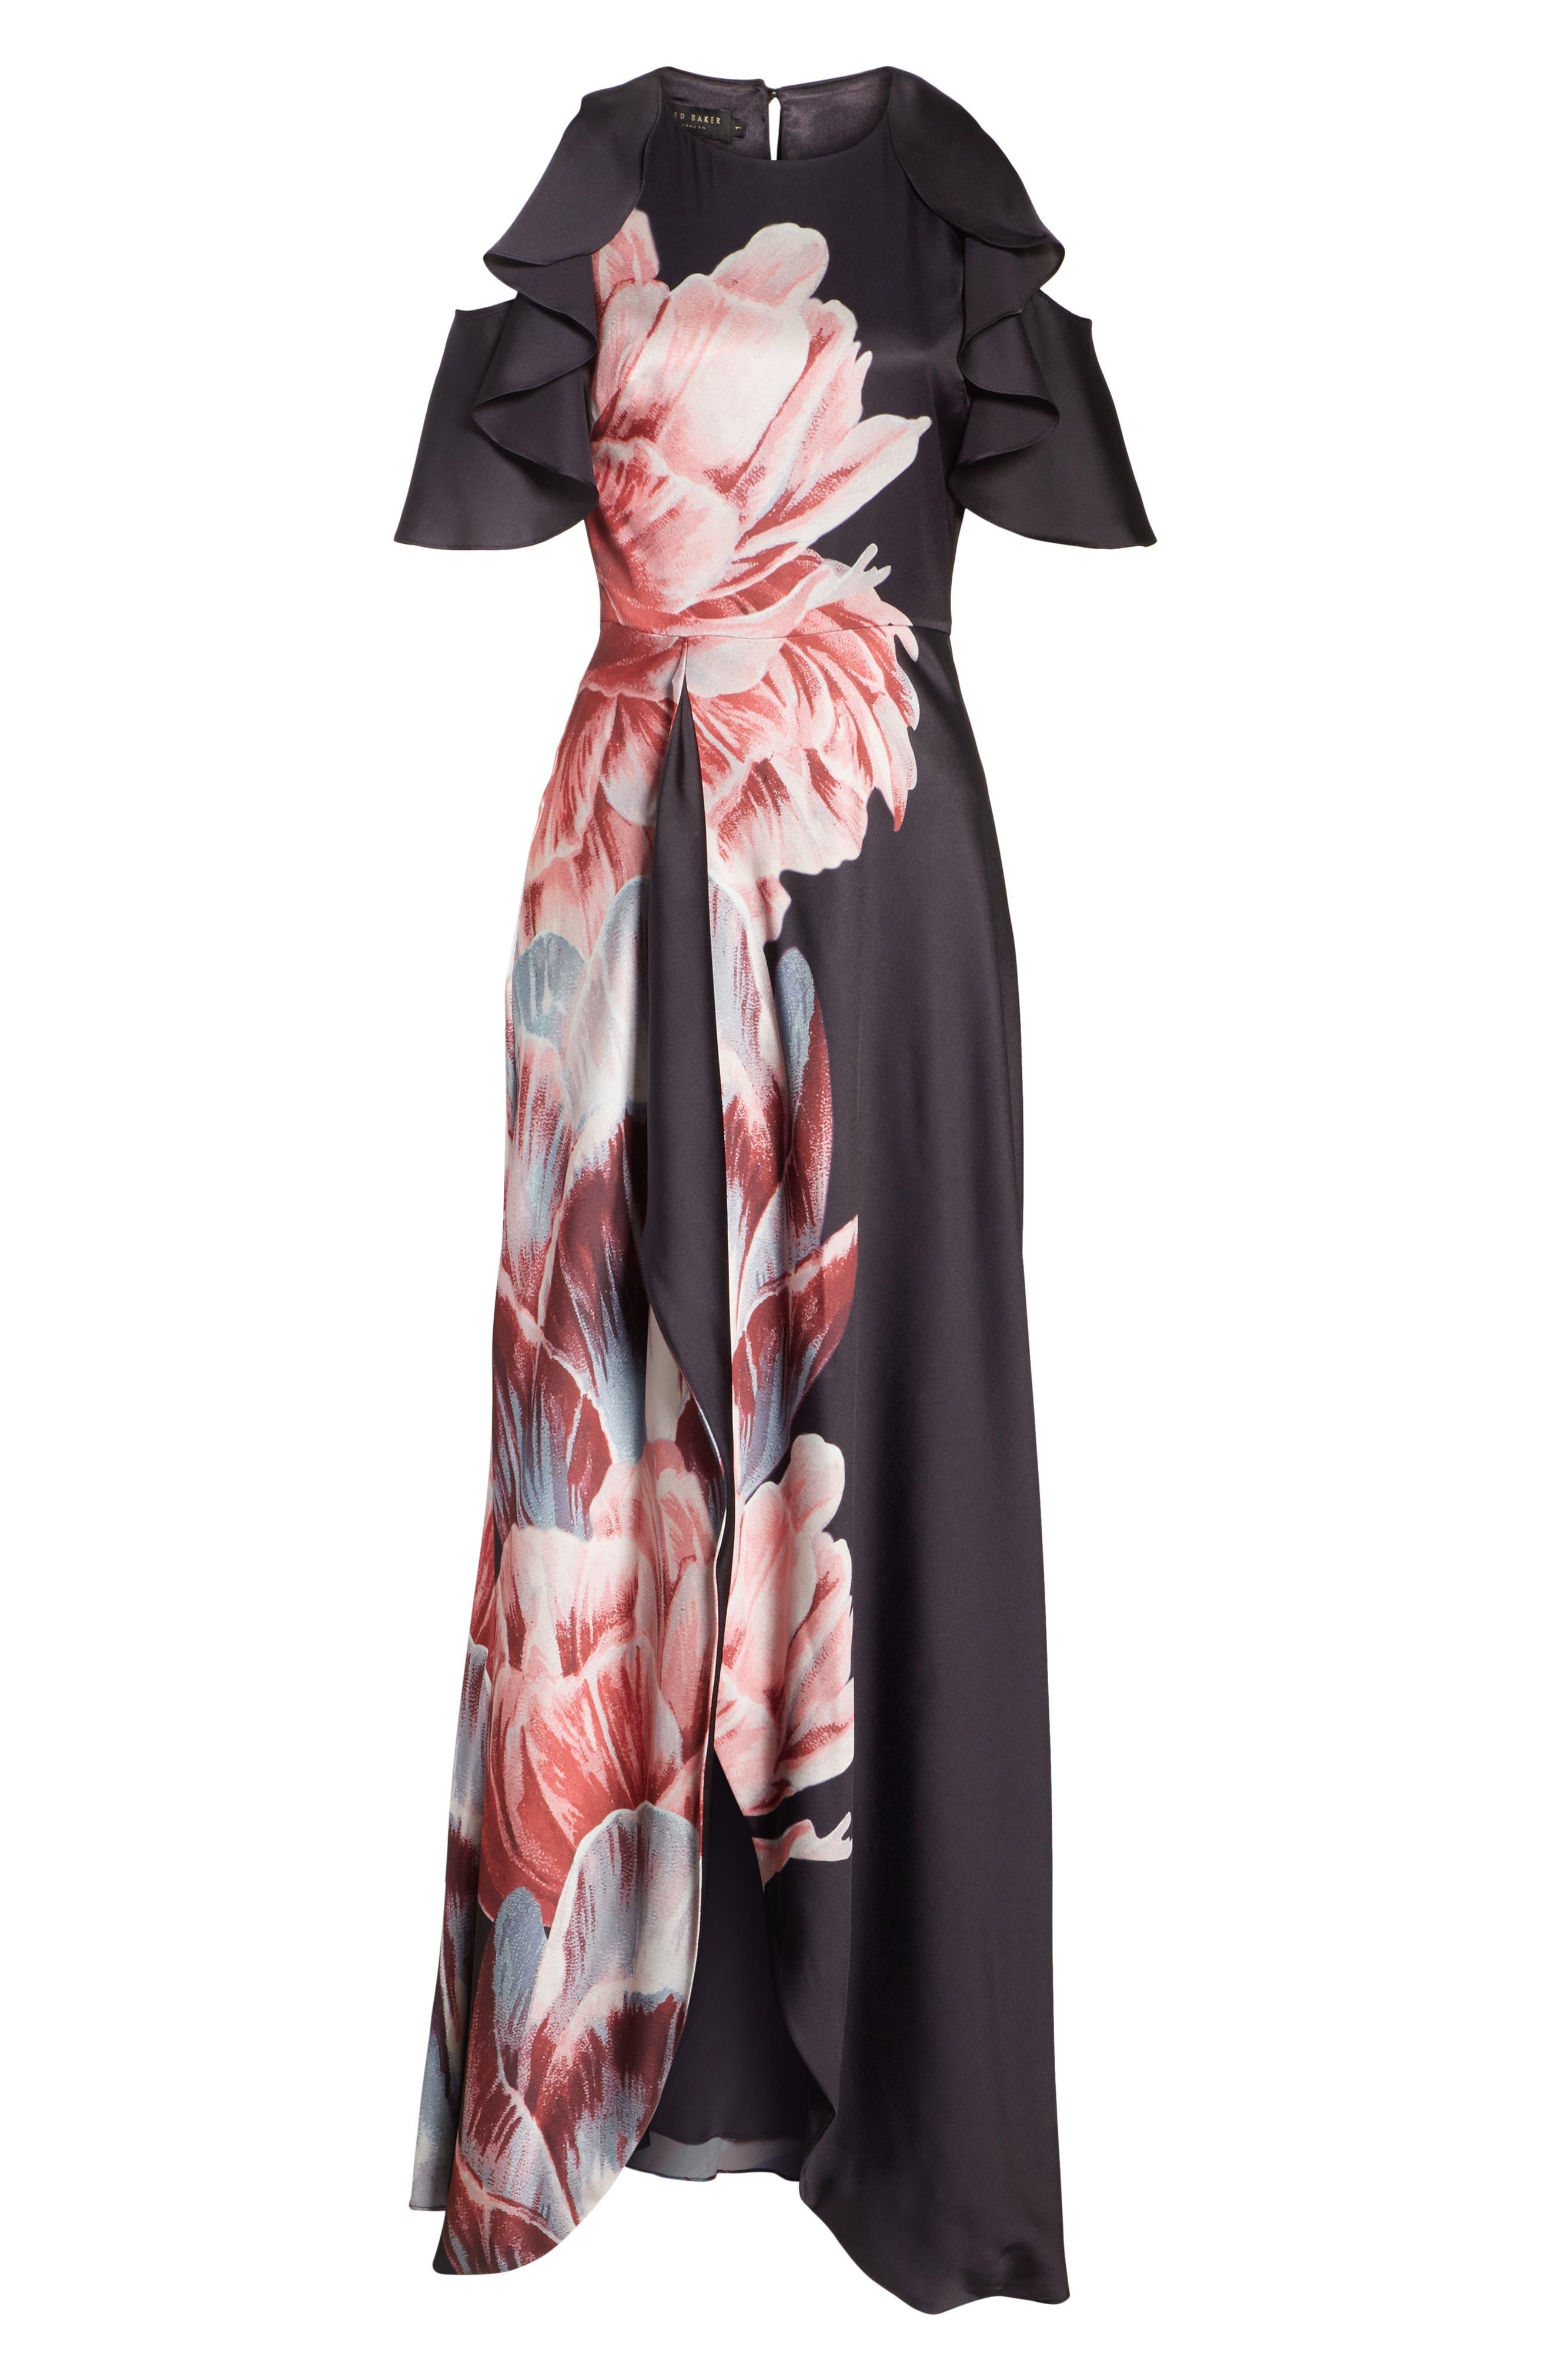 Ulrika Tranquility Ruffle Maxi Dress,                             Alternate thumbnail 8, color,                             BLACK